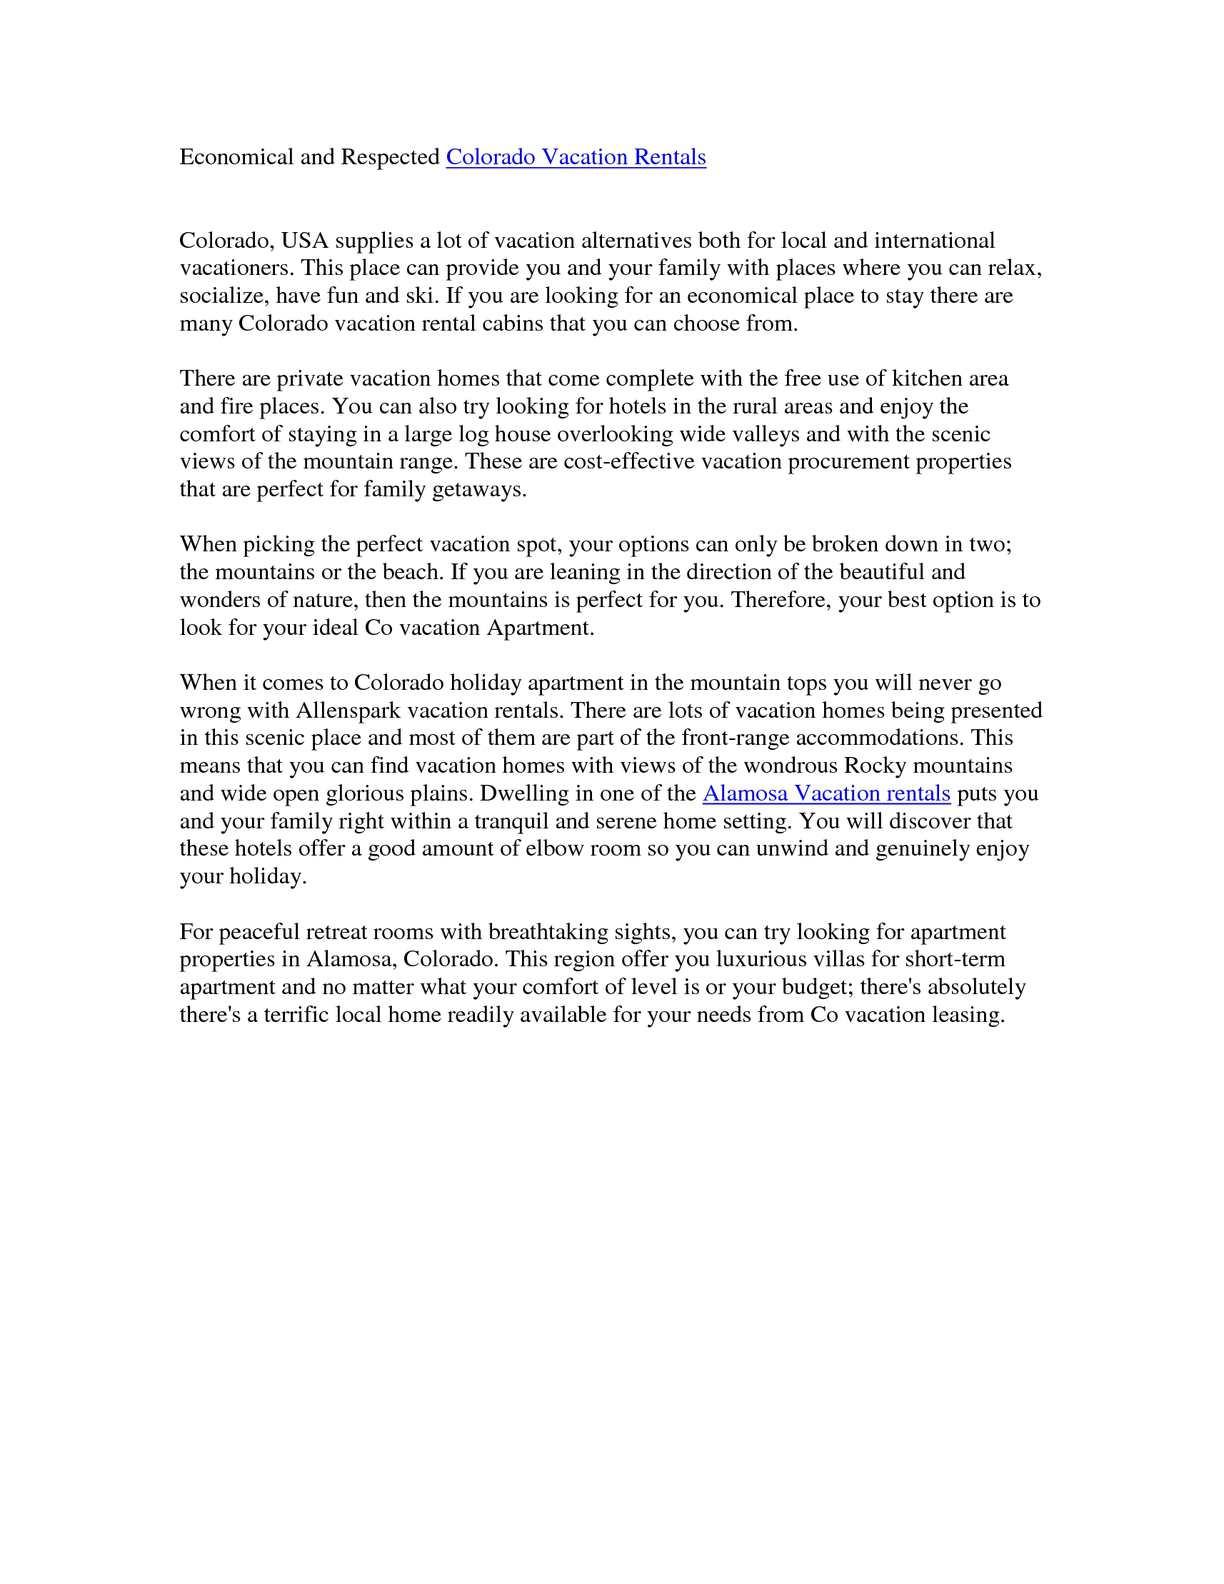 Calameo Economical And Respected Colorado Vacation Rentals